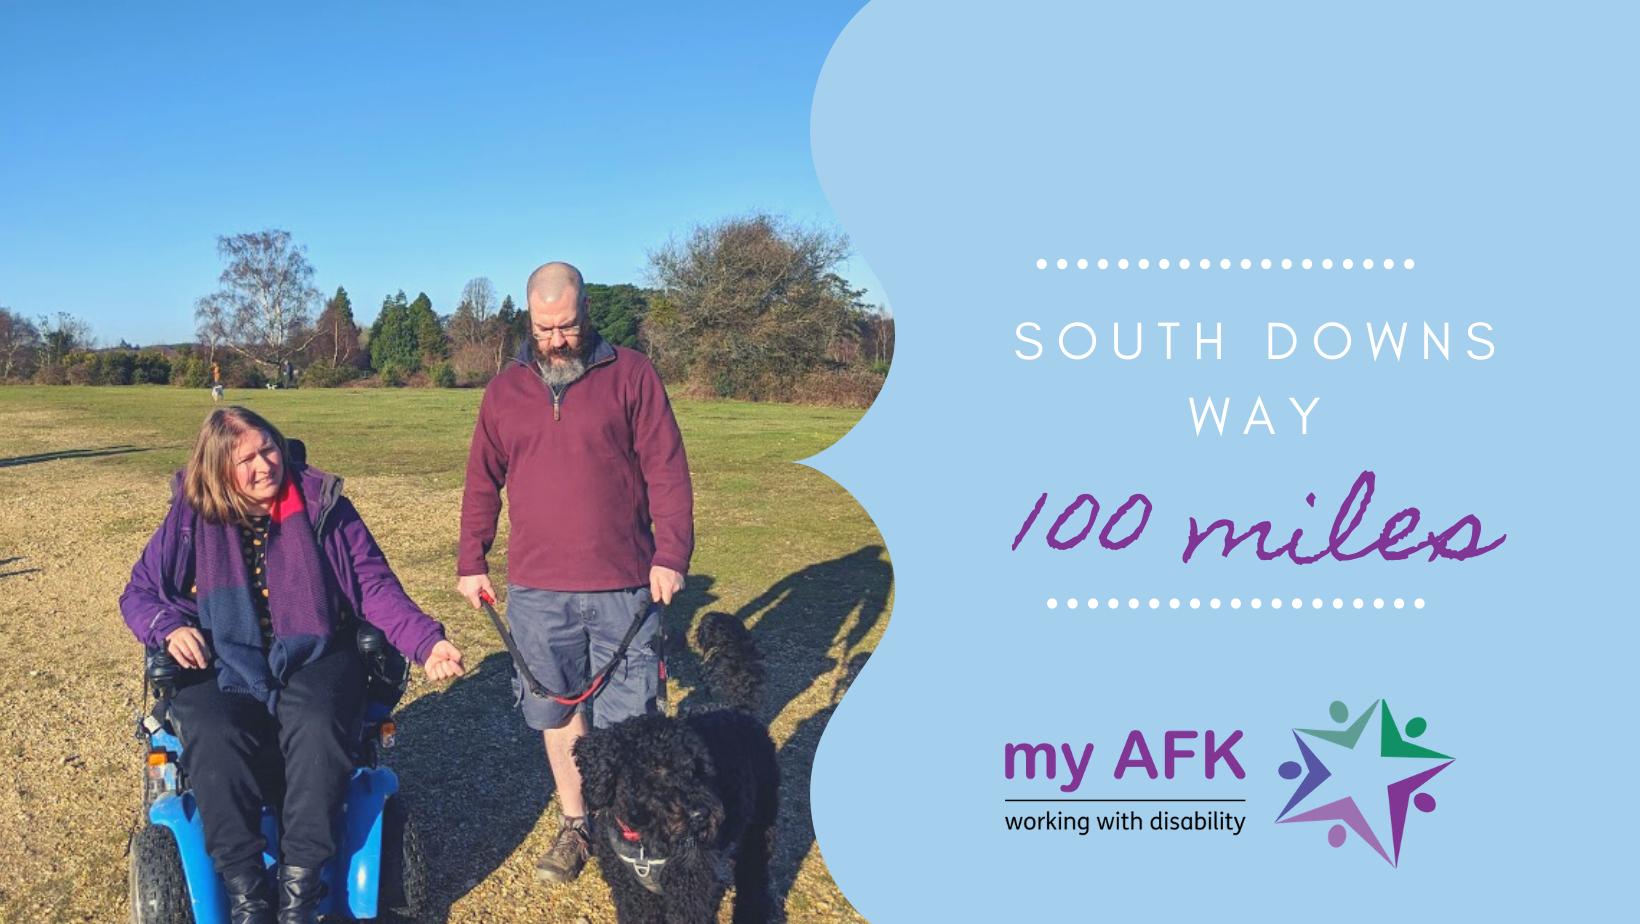 Dan Anna South Downs Way for my AFK 2020  - Dan & Anna take on South Downs Way for 'my AFK'